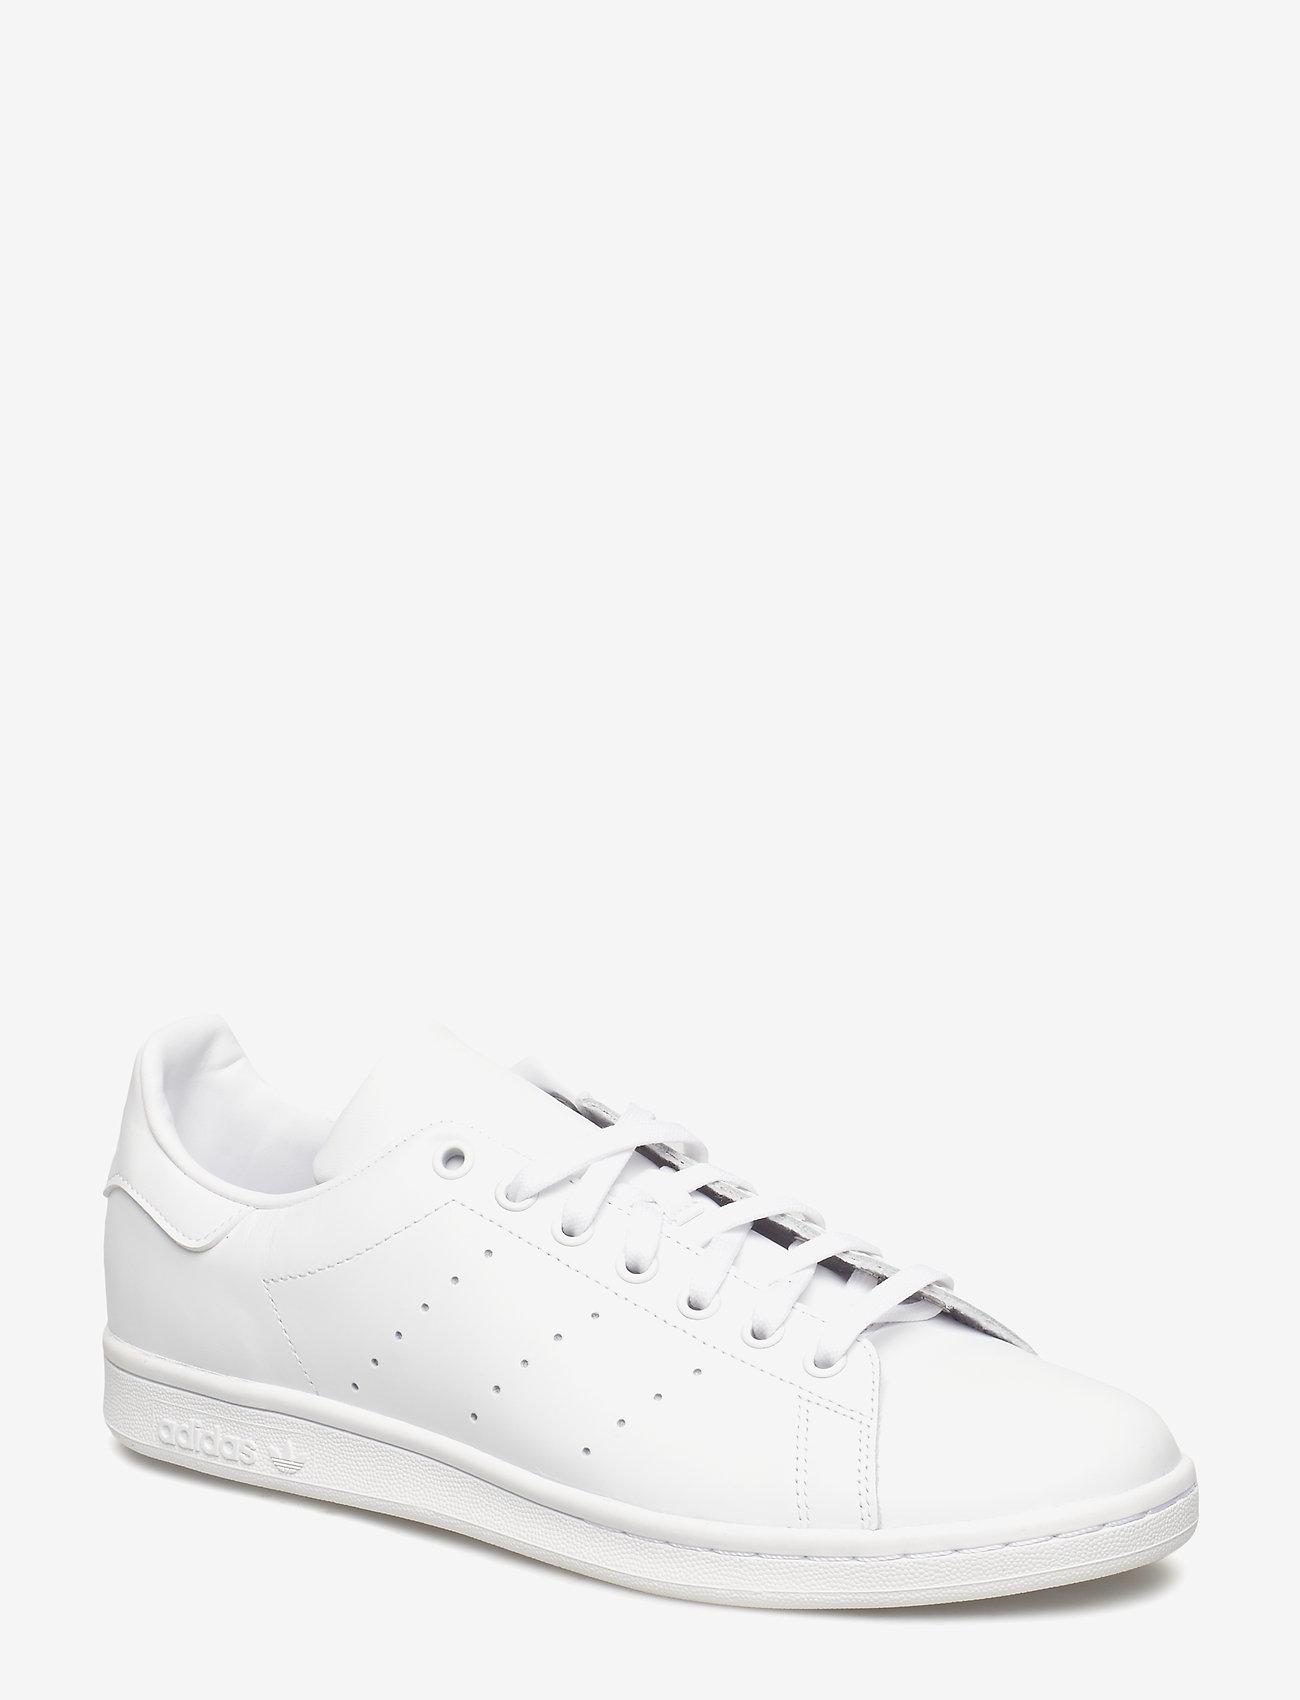 adidas Originals - STAN SMITH - lav ankel - ftwwht/ftwwht/ftwwht - 0